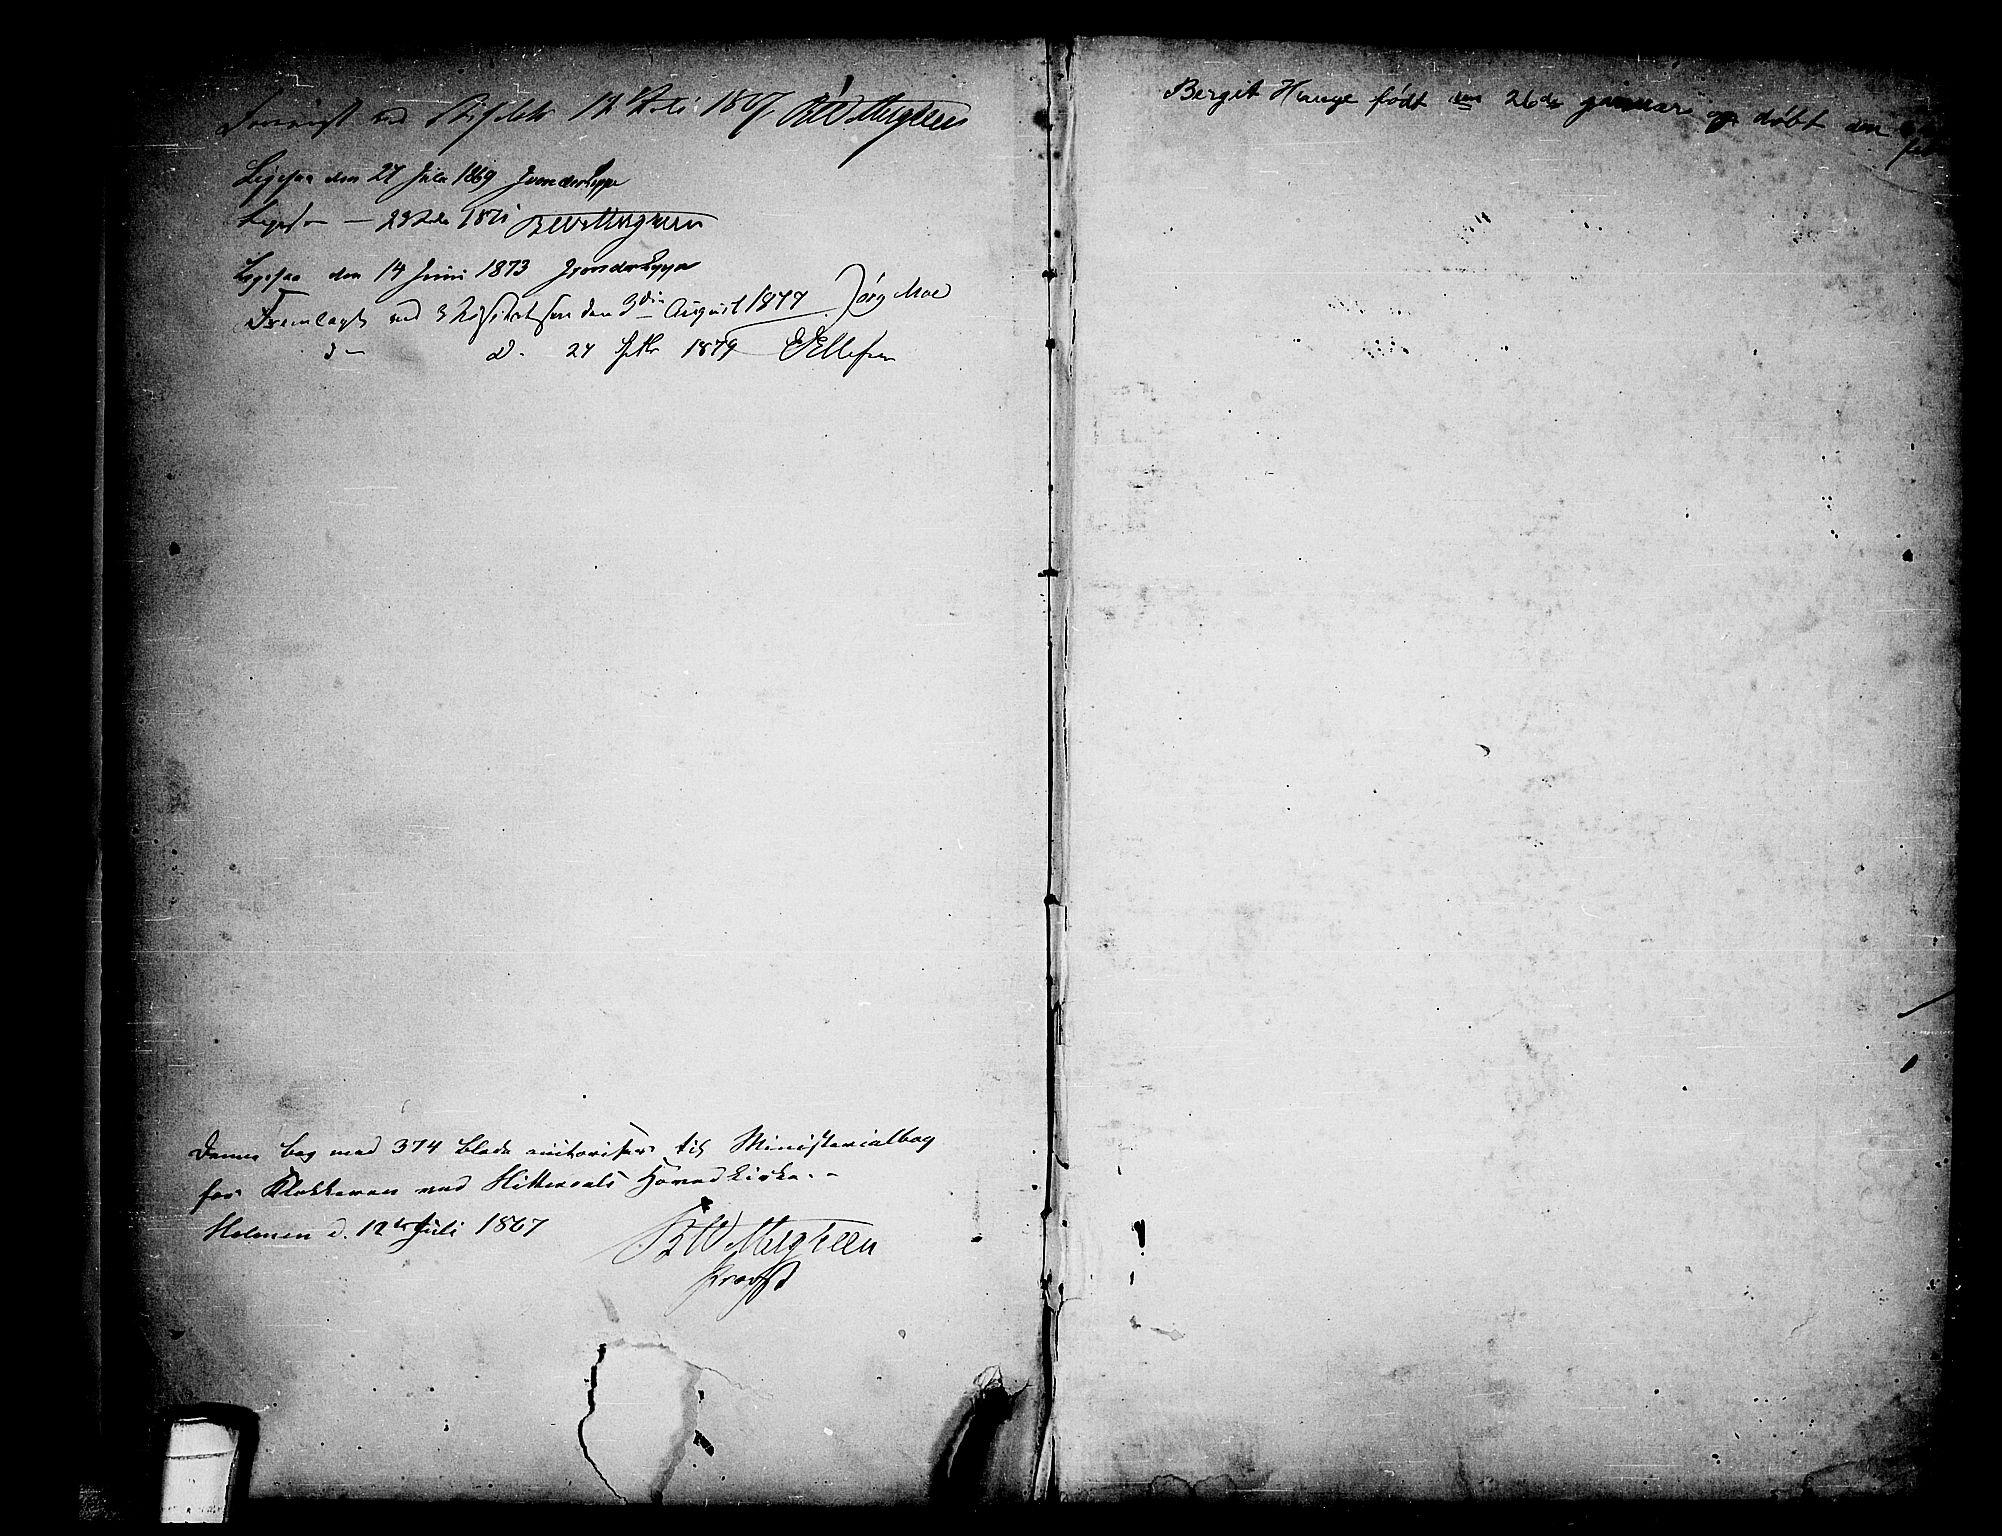 SAKO, Heddal kirkebøker, G/Ga/L0001: Klokkerbok nr. I 1, 1866-1878, s. 374-375